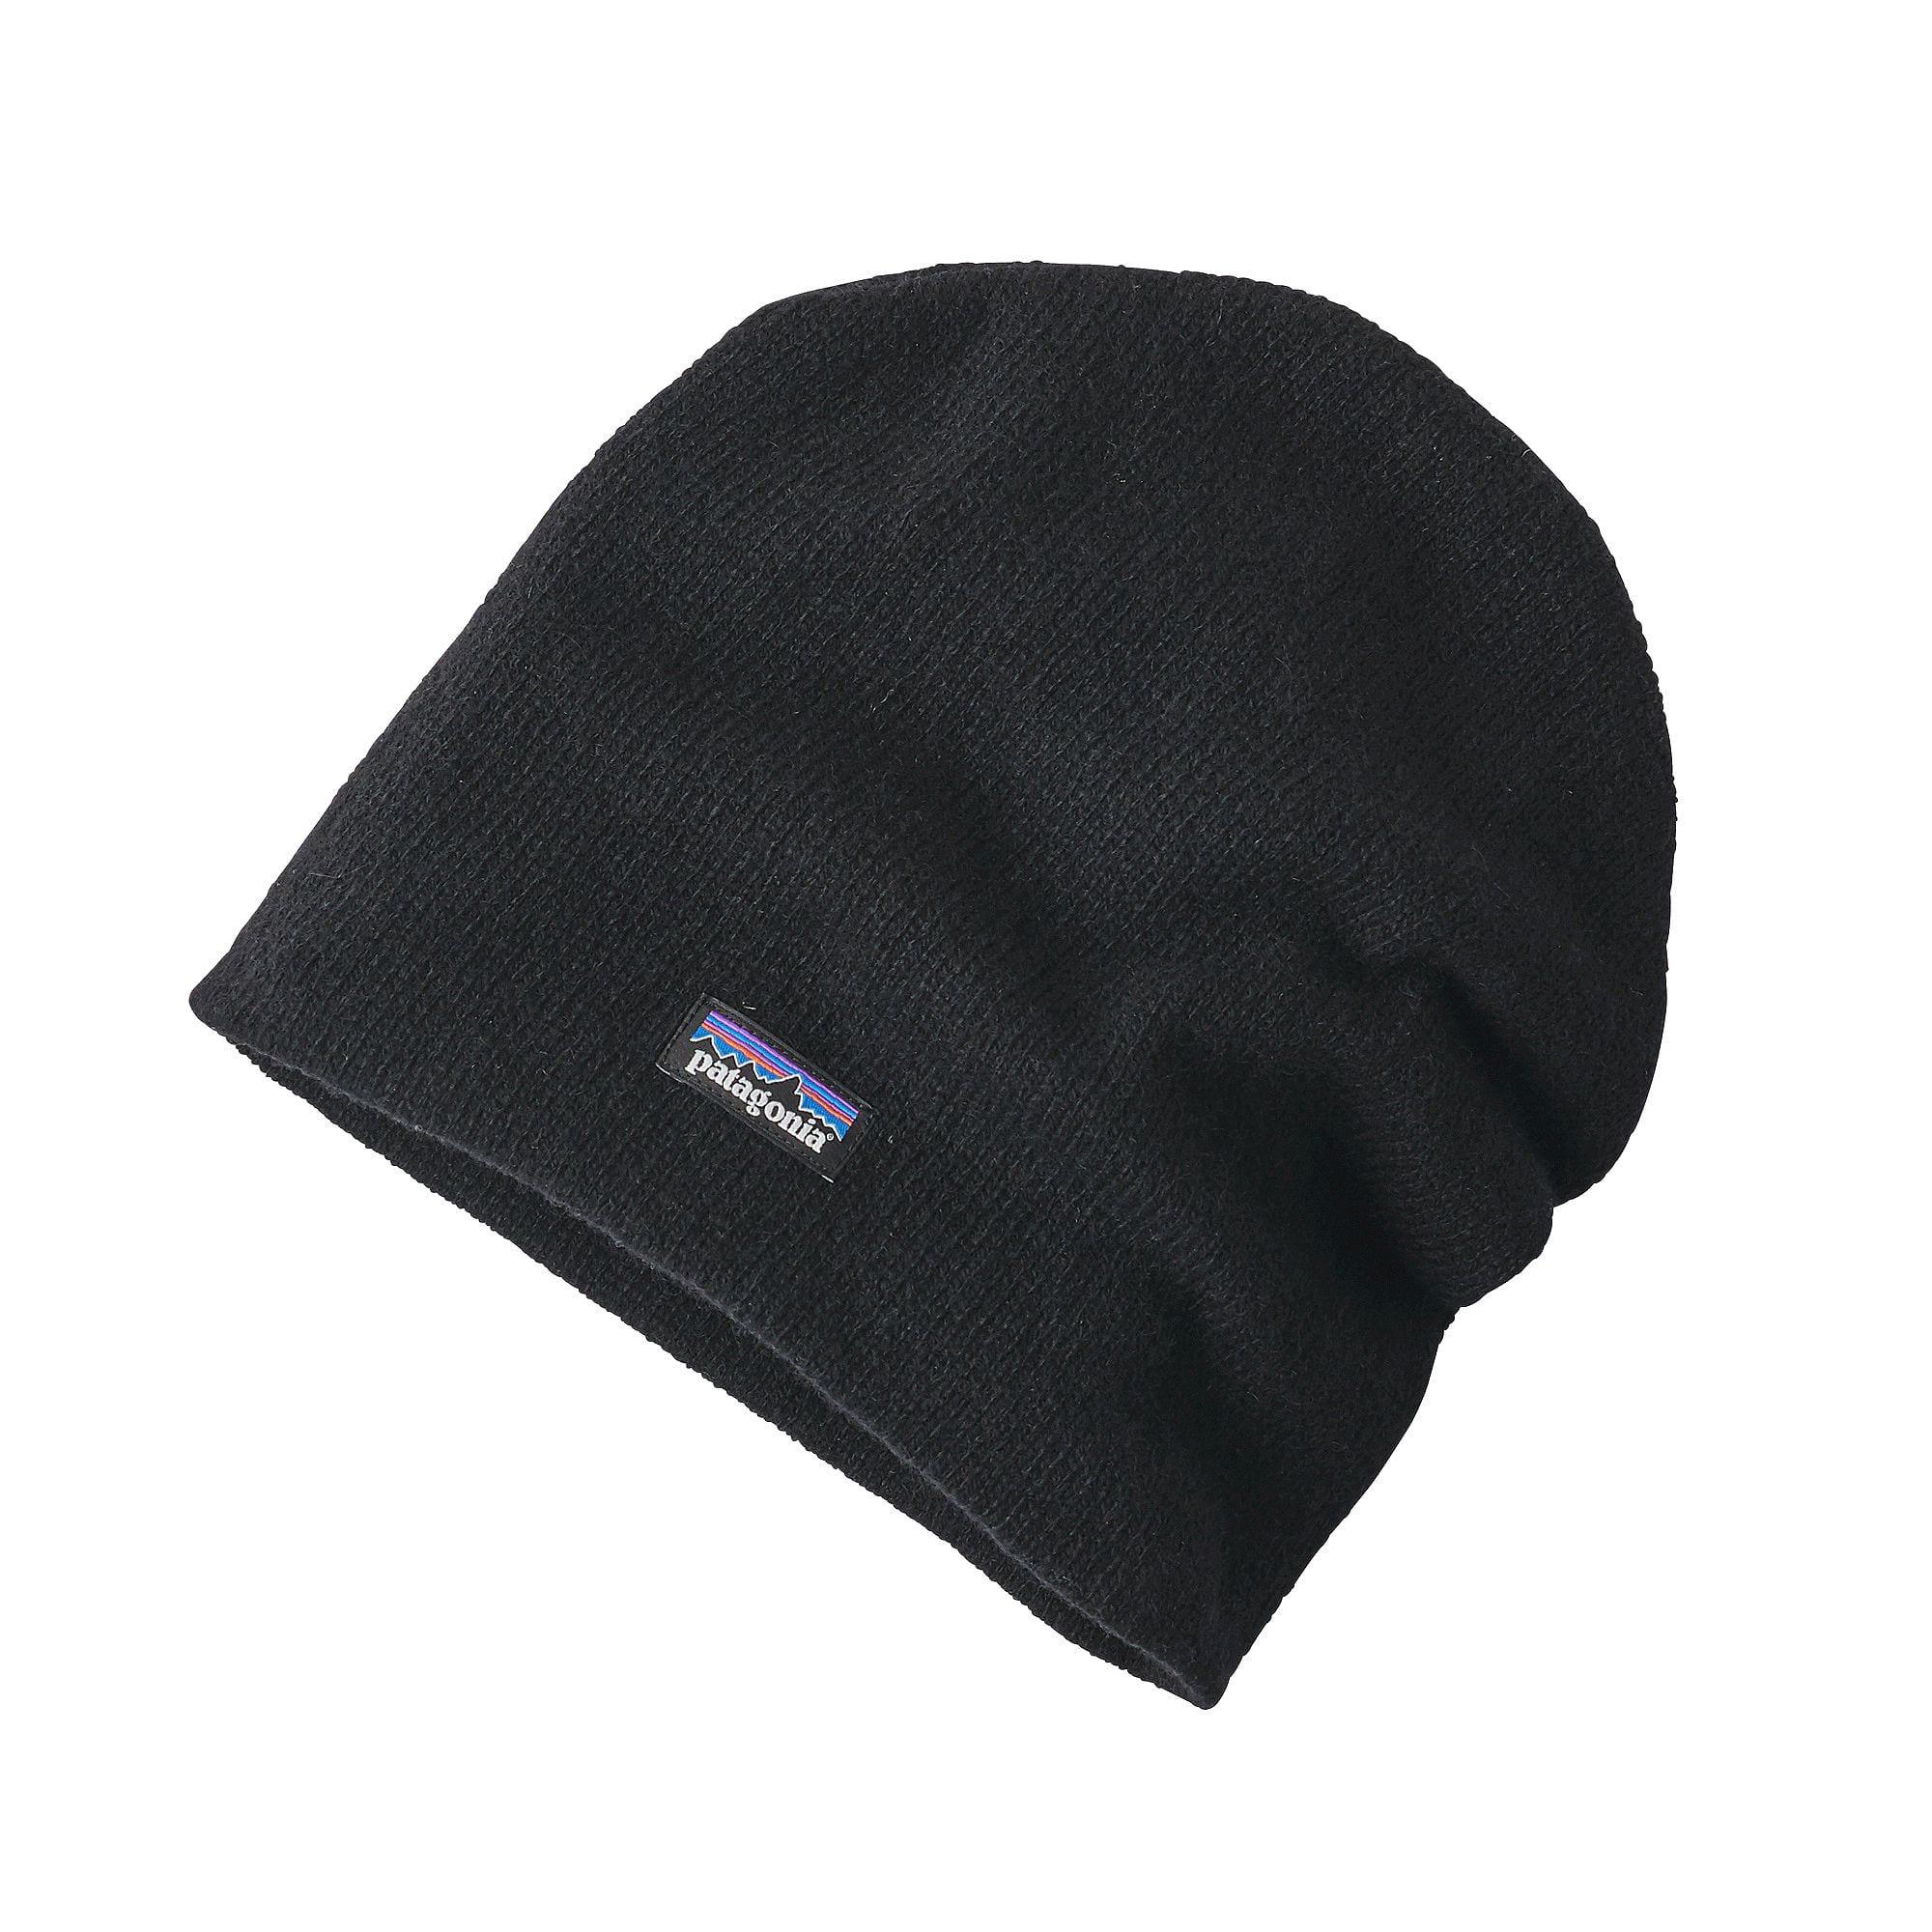 Patagonia Backslide Beanie Hat The Sporting Lodge